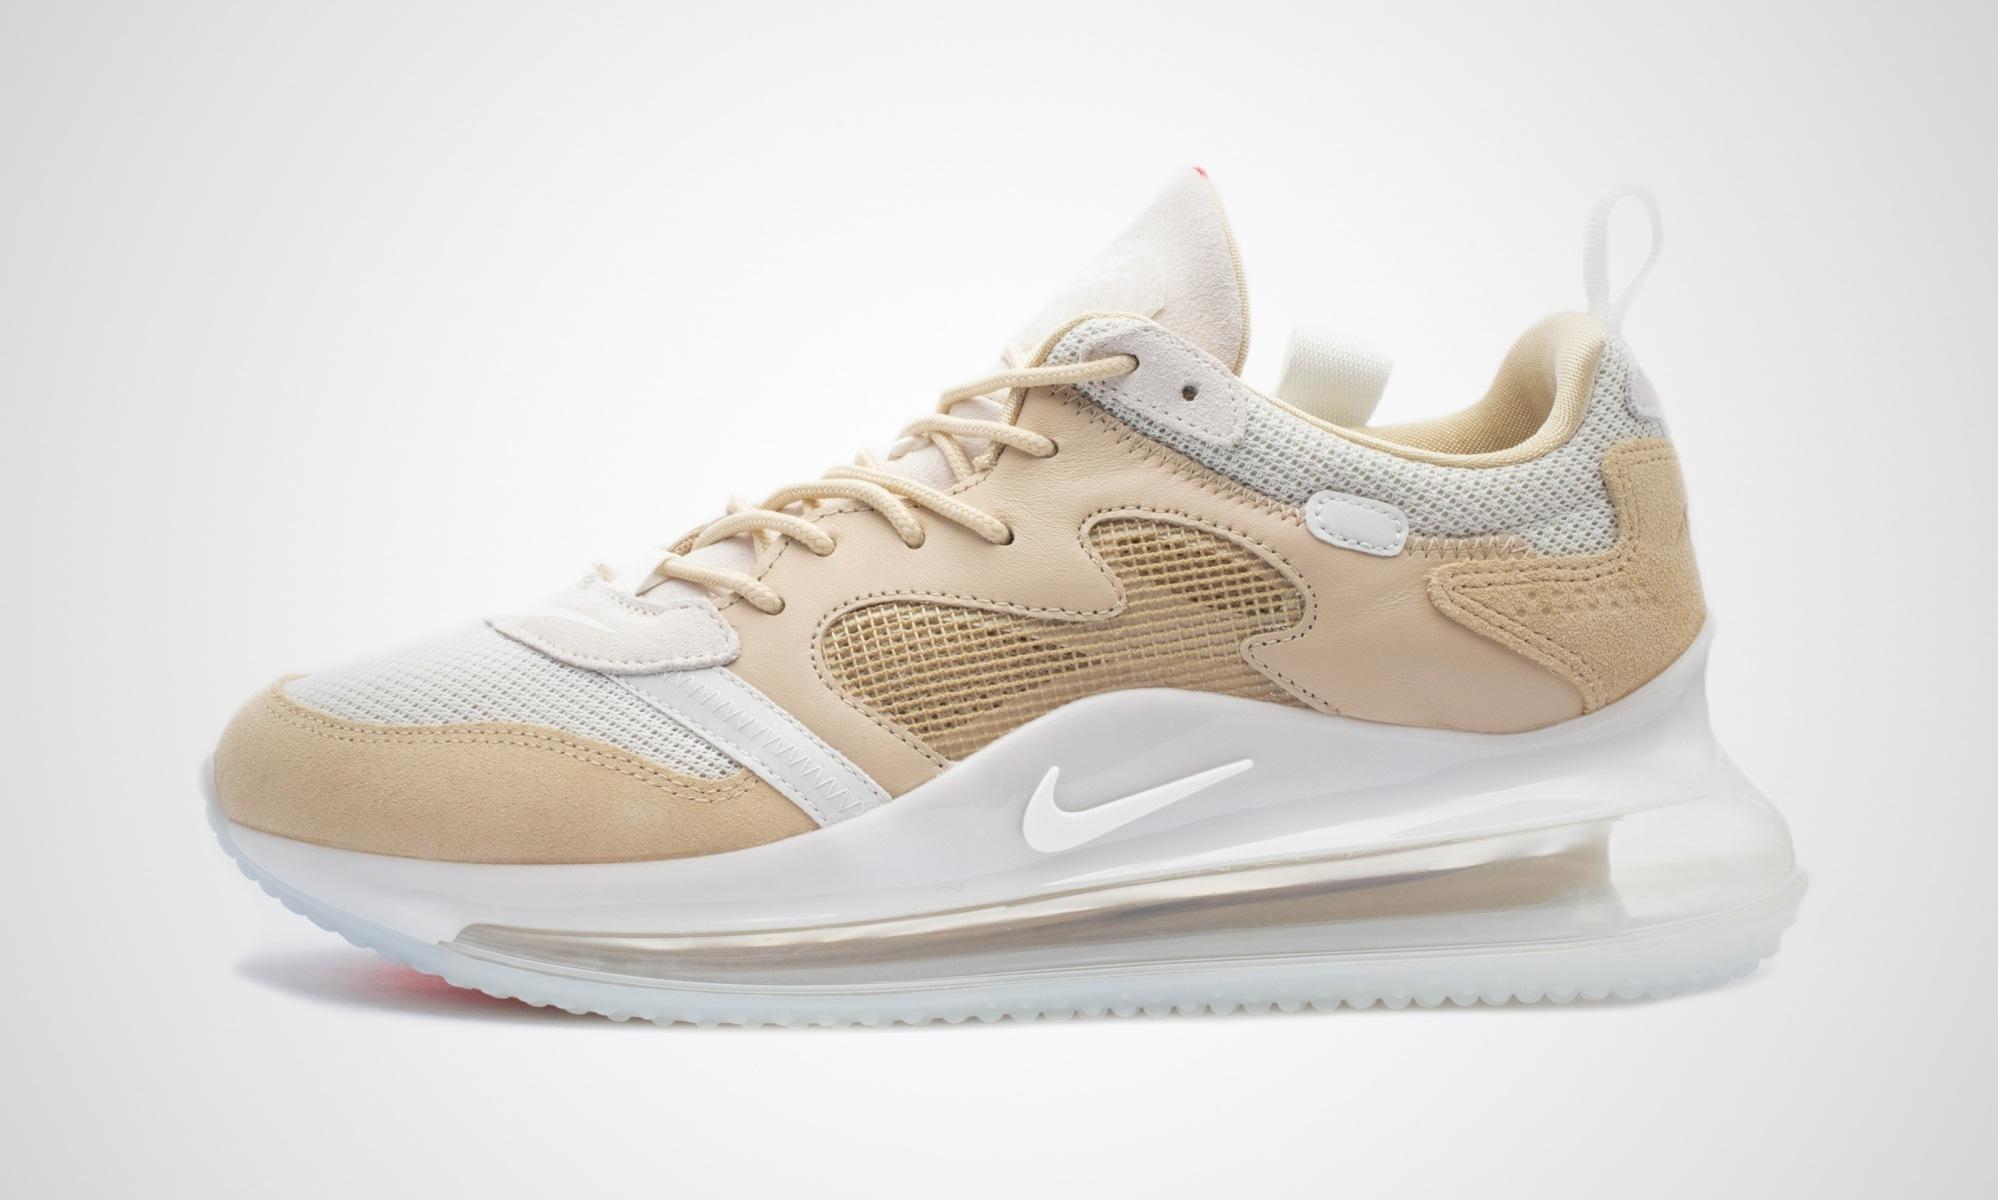 Nike LAB x OBJ Air Max 720 Young King of the Drip CK2531 900 | 43einhalb Sneaker Store